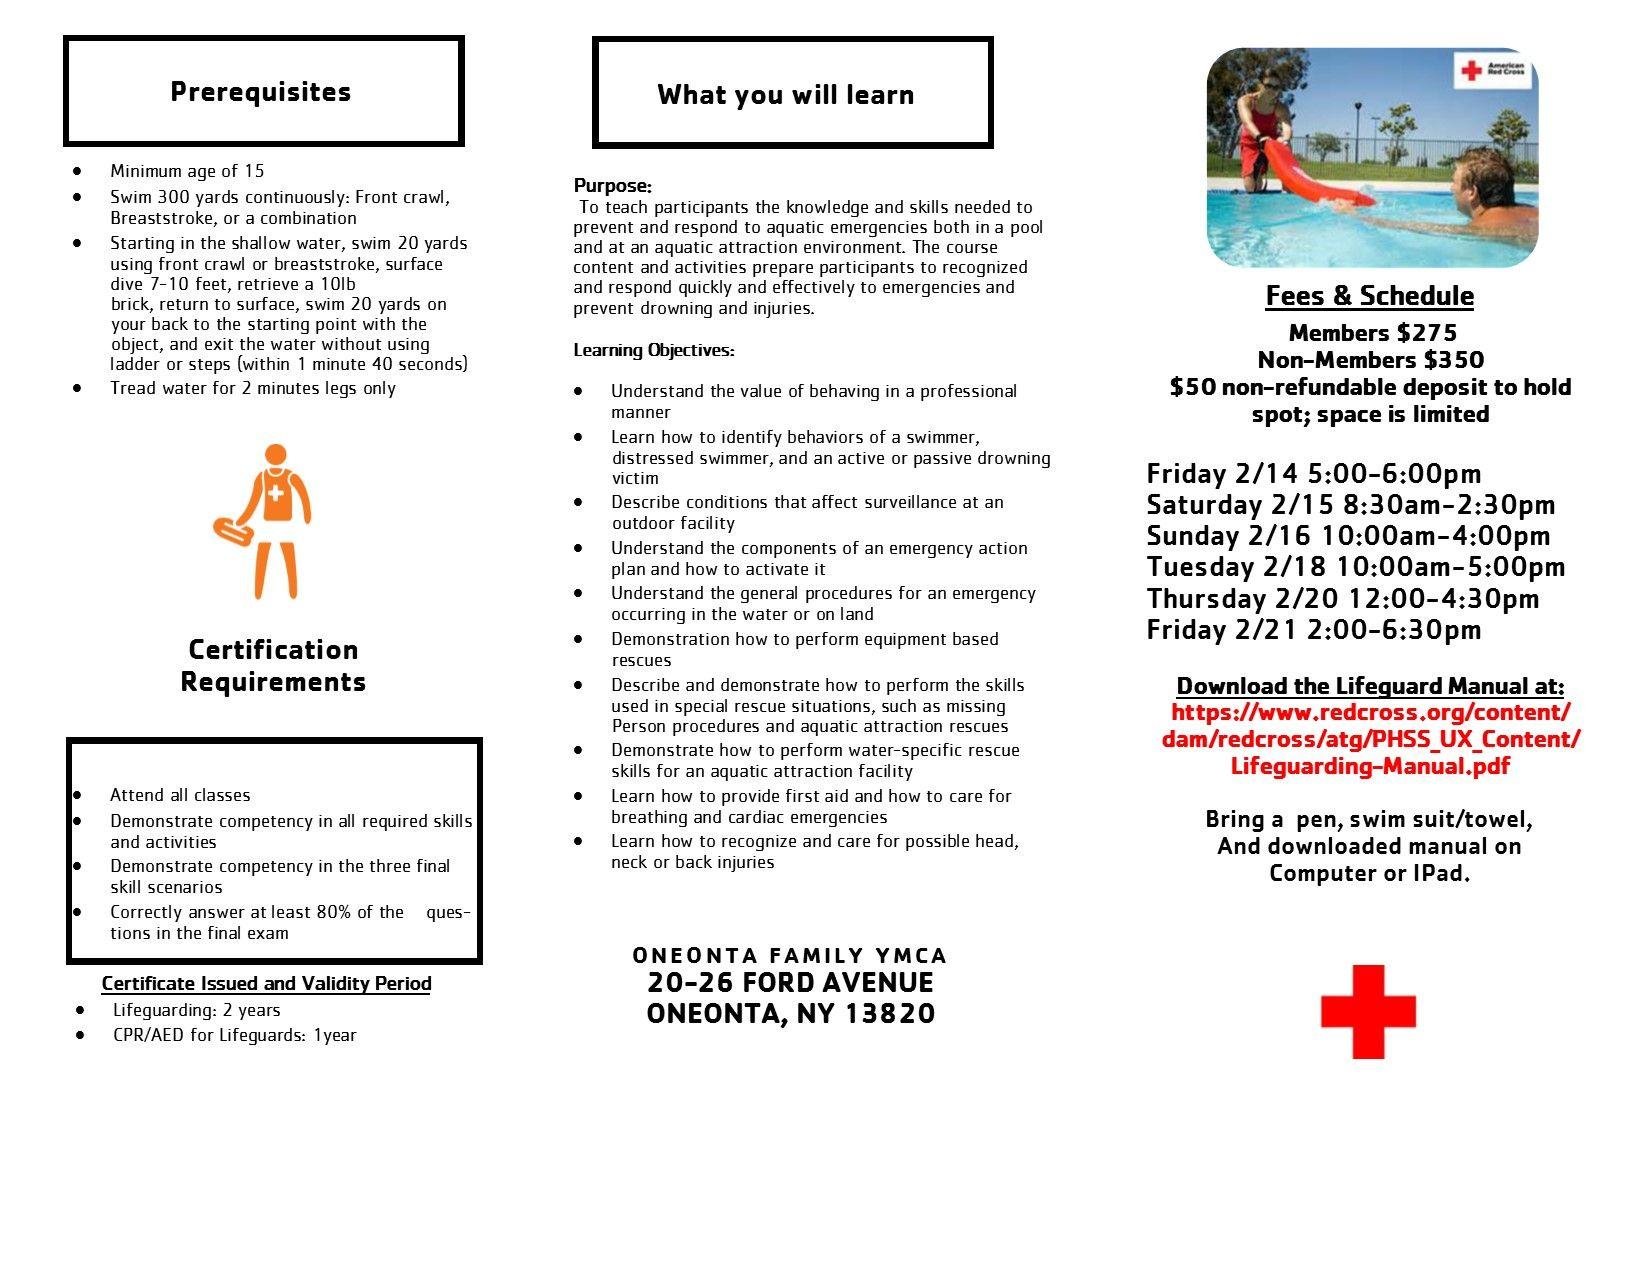 Feb. Lifeguard Course Brochure